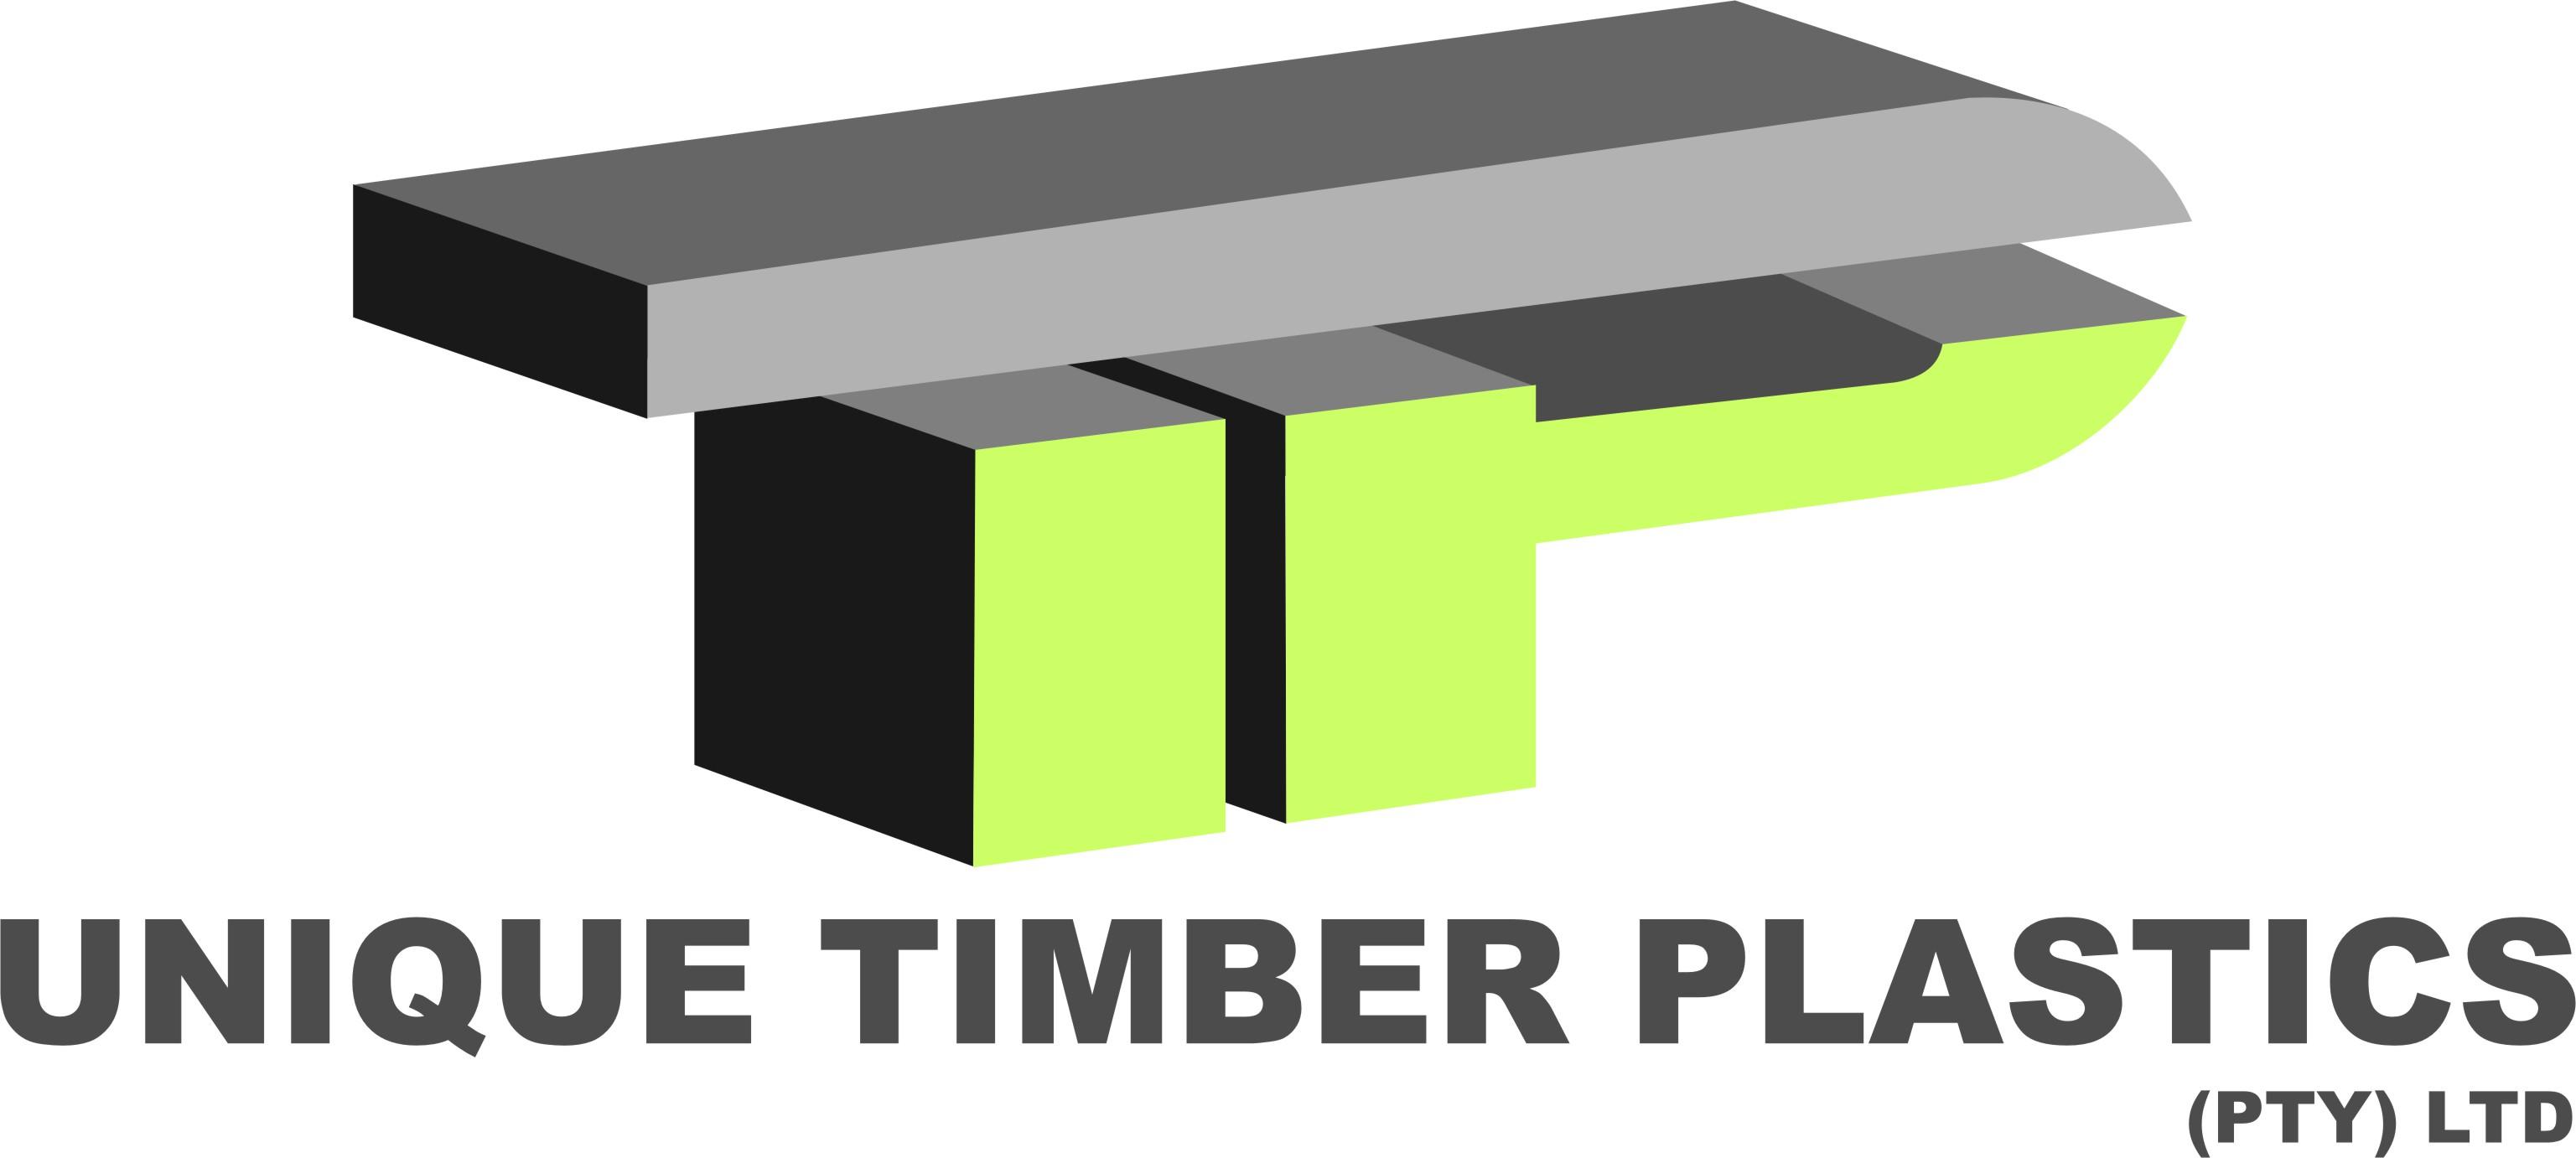 Unique Timber Plastics Johanneburg